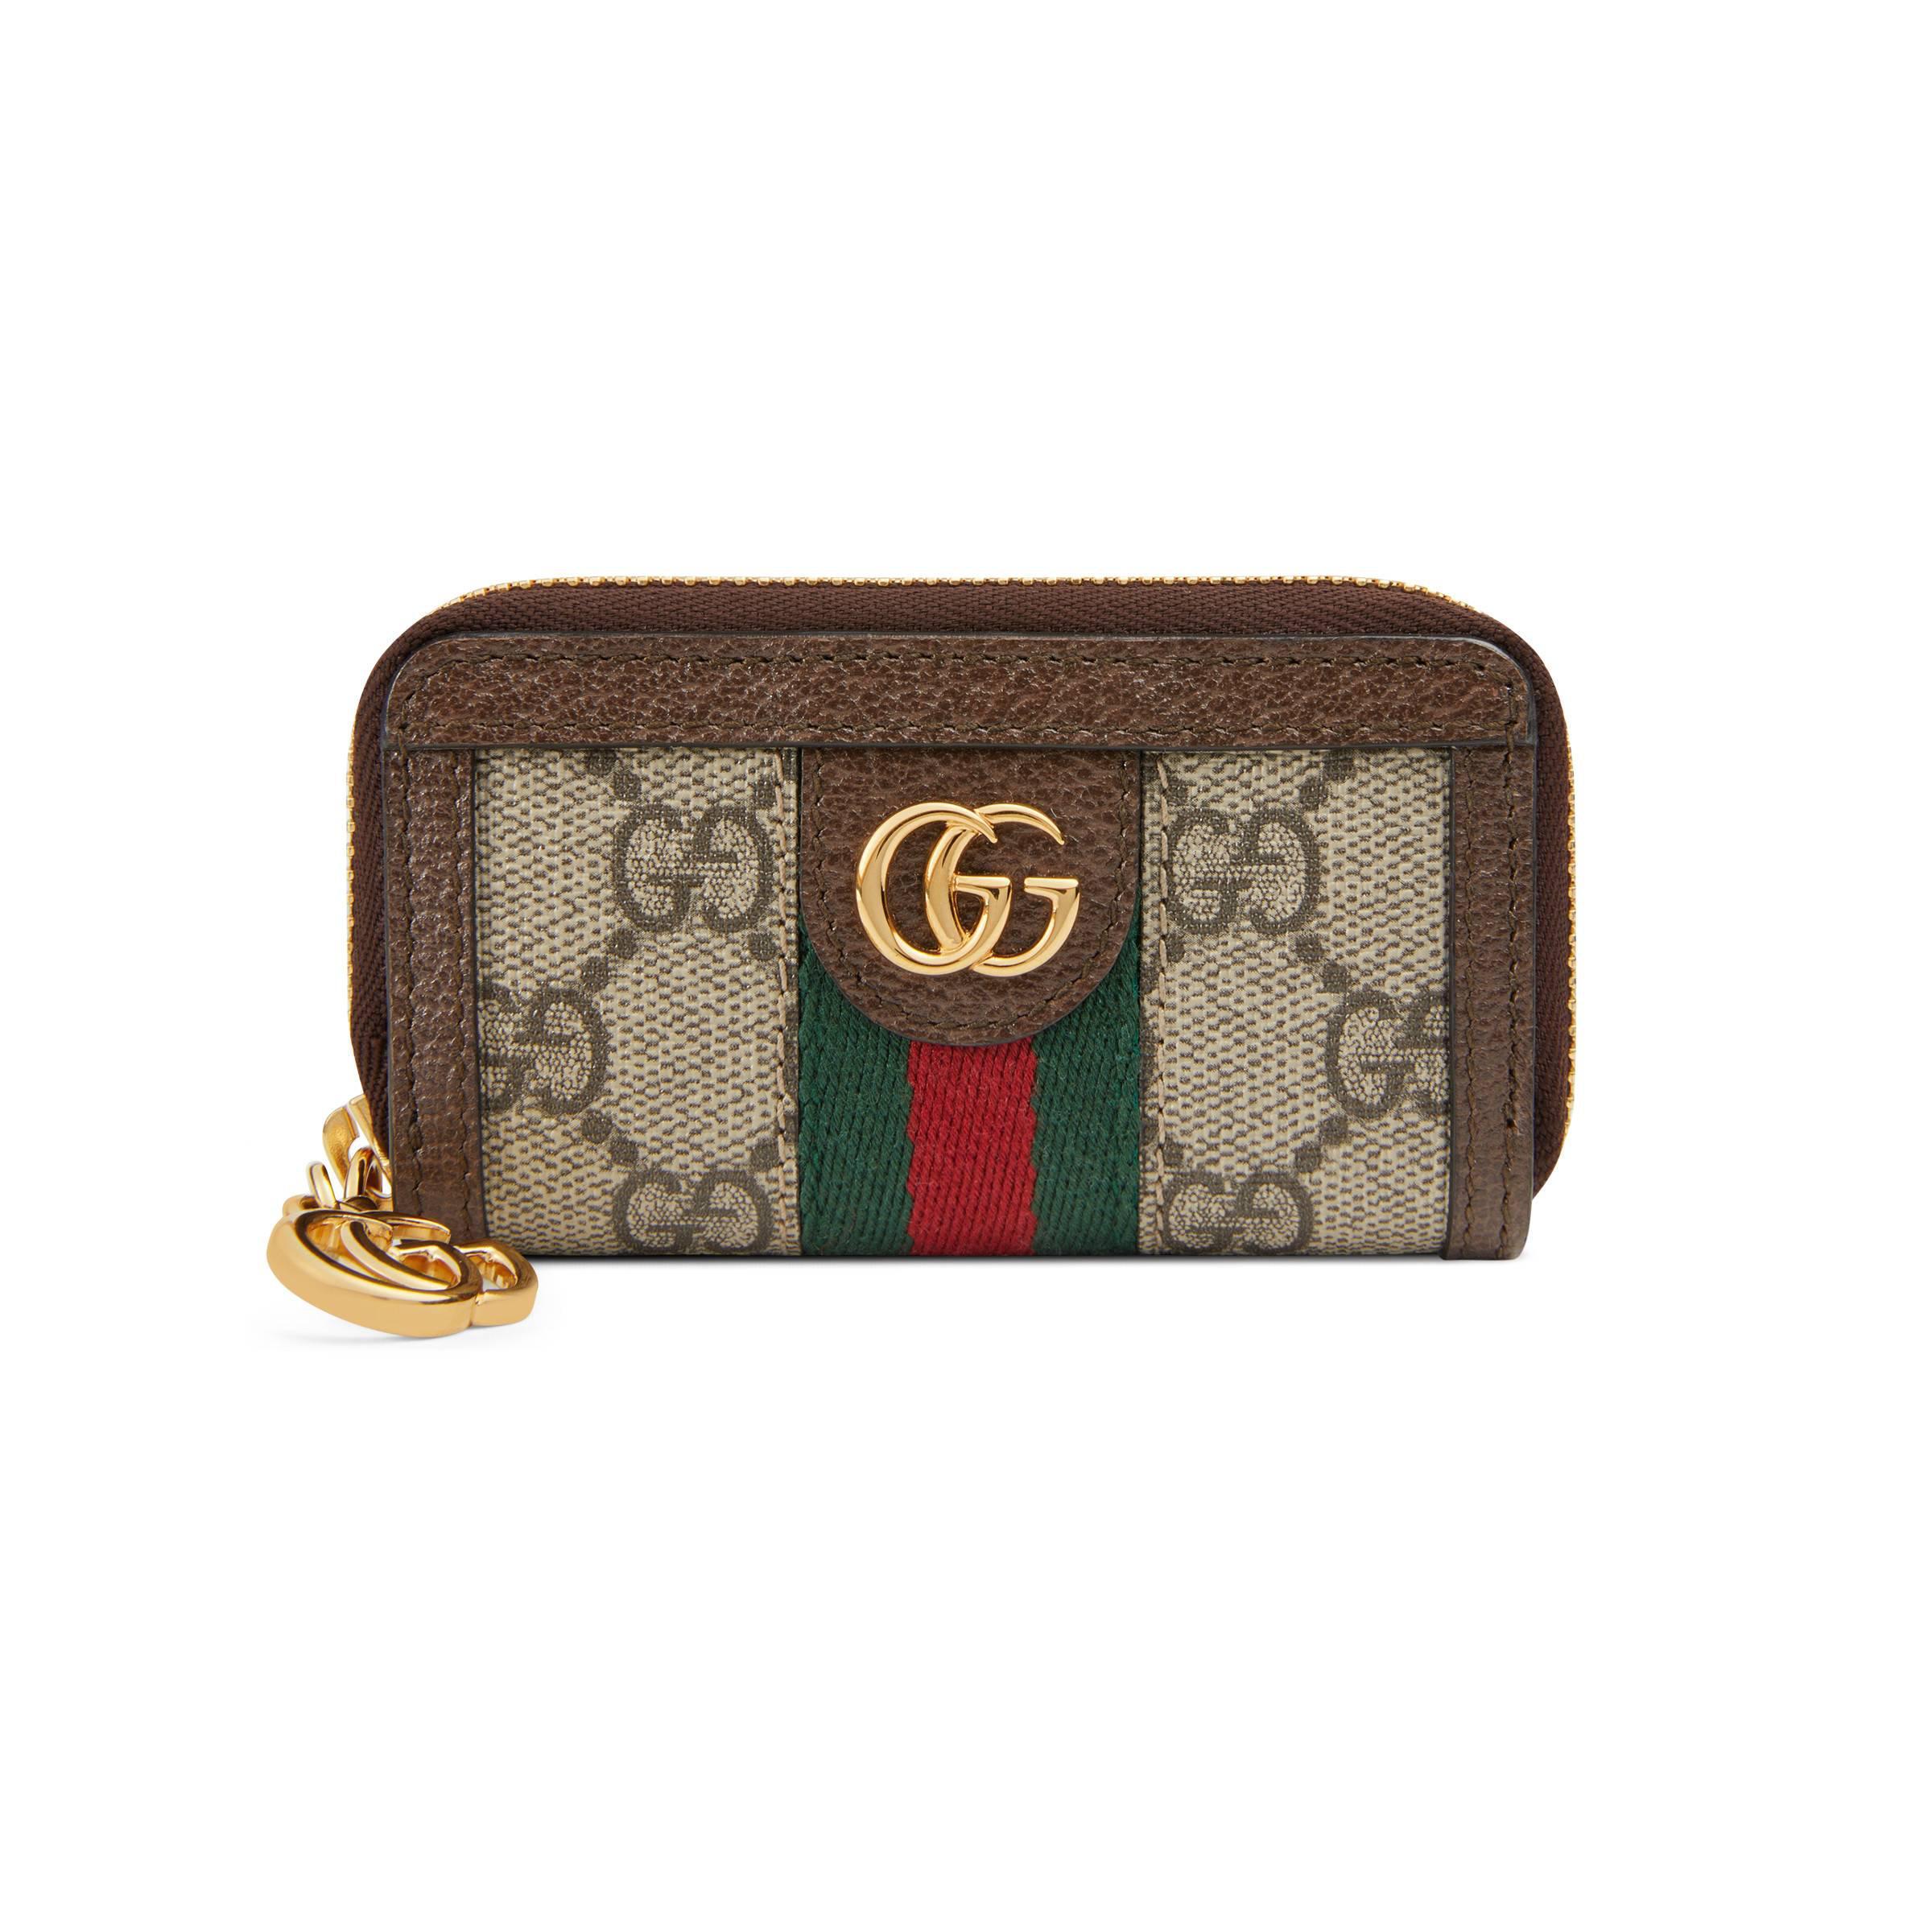 ec8b1fa23f526 Gucci - Natural Ophidia Schlüsseletui mit GG - Lyst. Vollbild ansehen